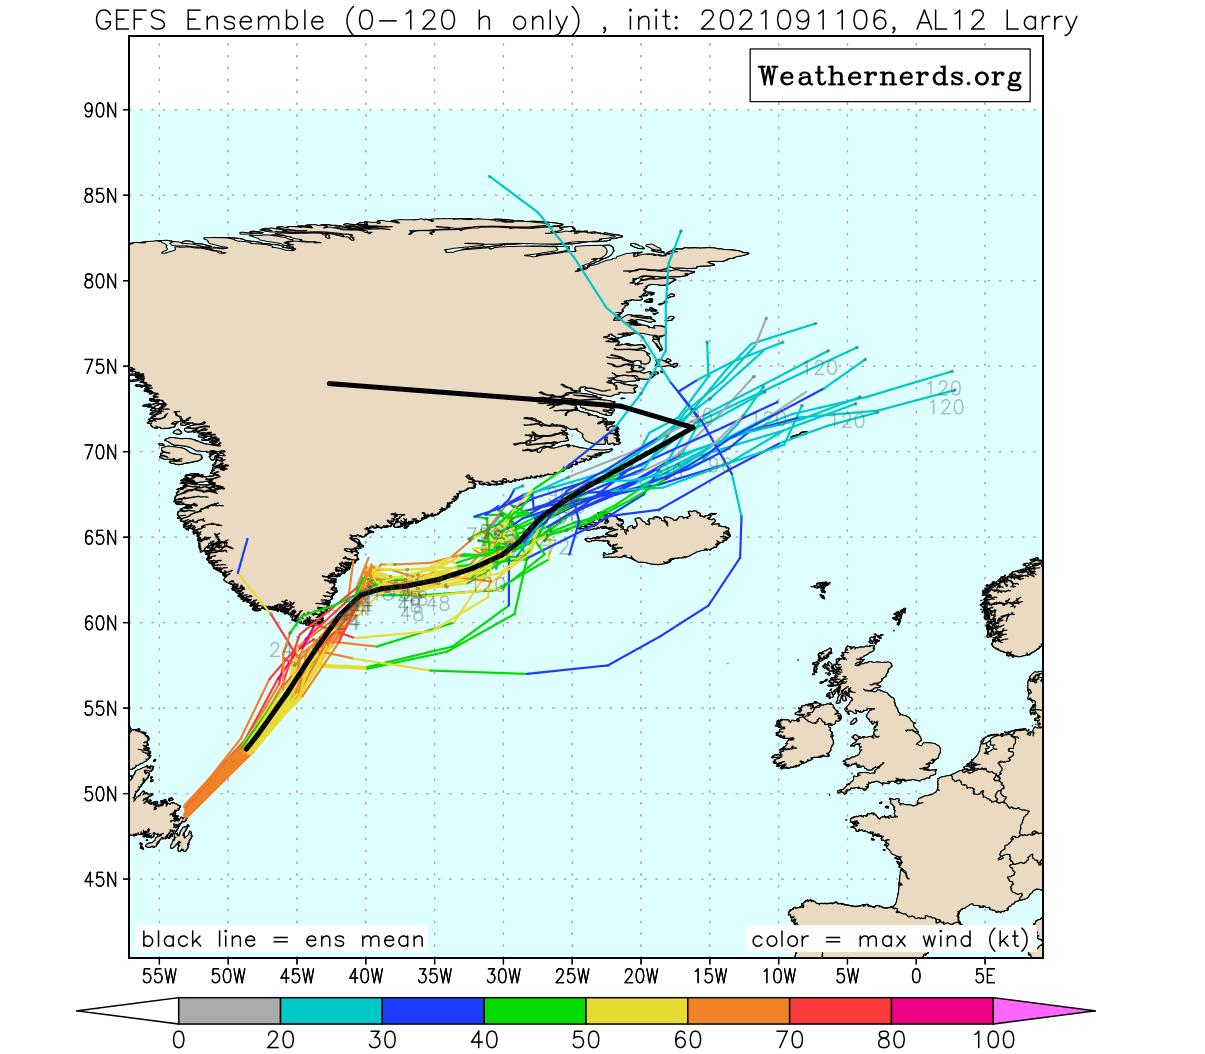 atlantic-hurricane-season-2021-larry-winter-storm-forecast-snow-greenland-track